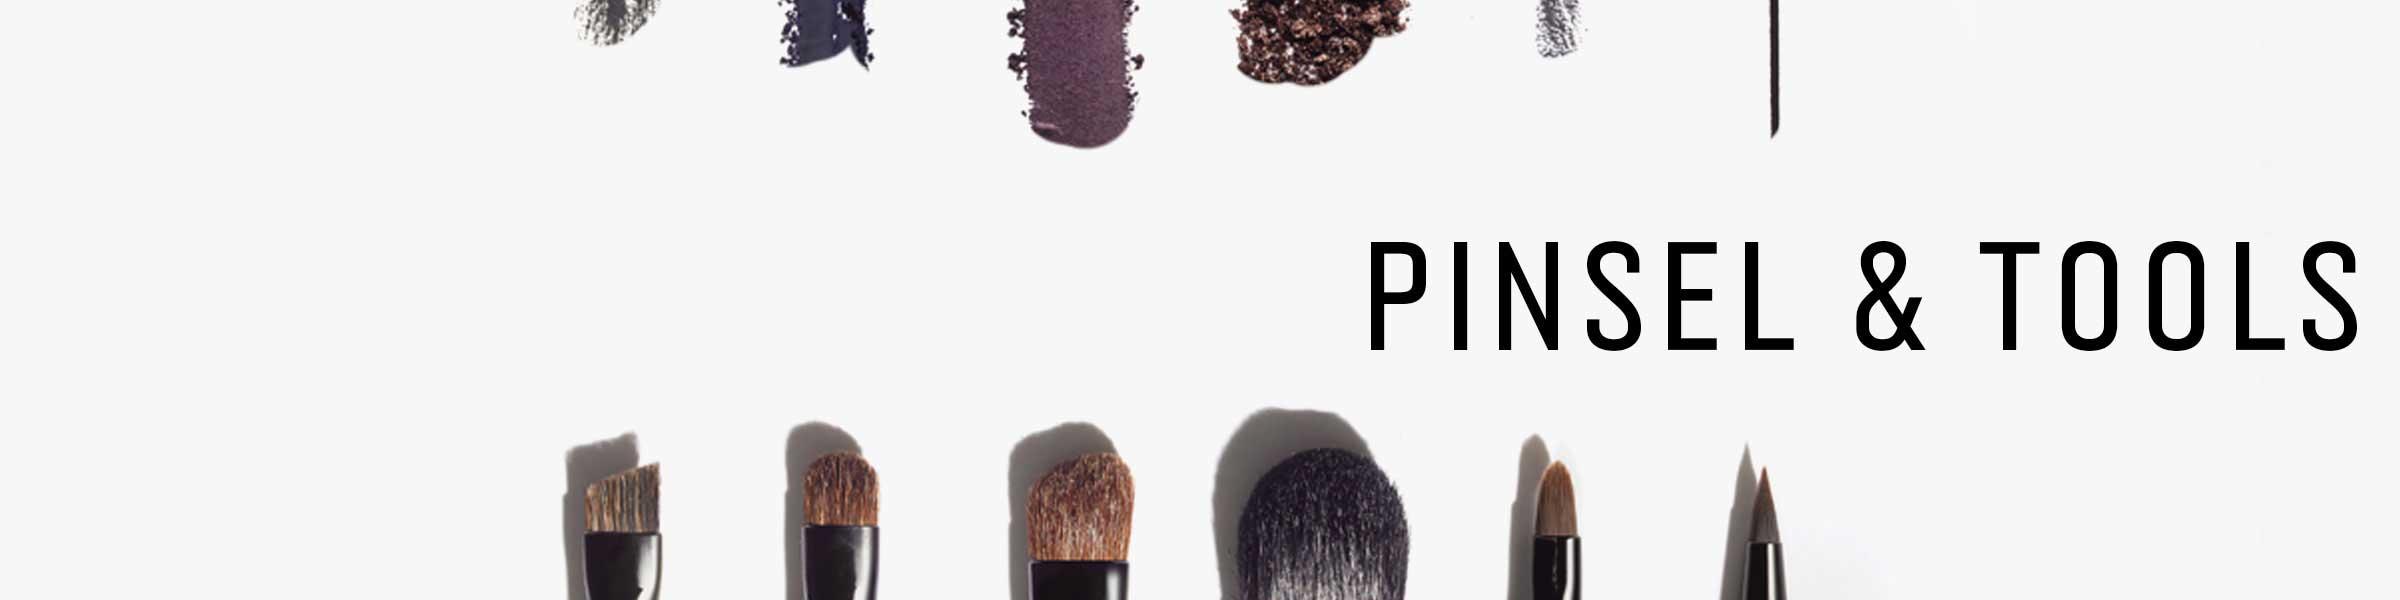 Pinsel & Tools